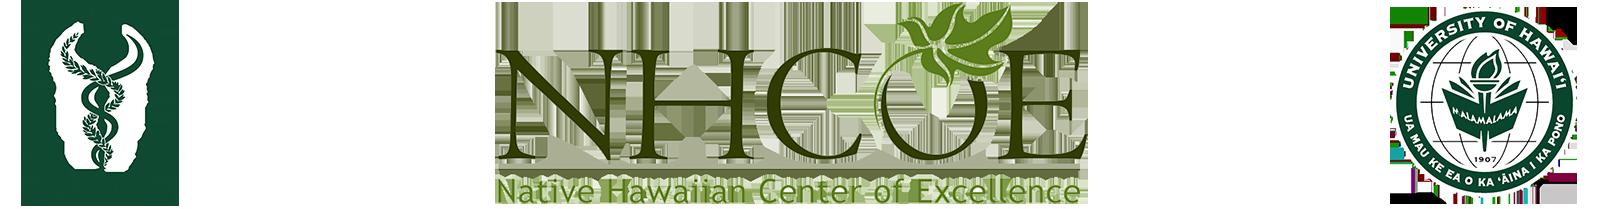 Native Hawaiian Health Center of Excellence